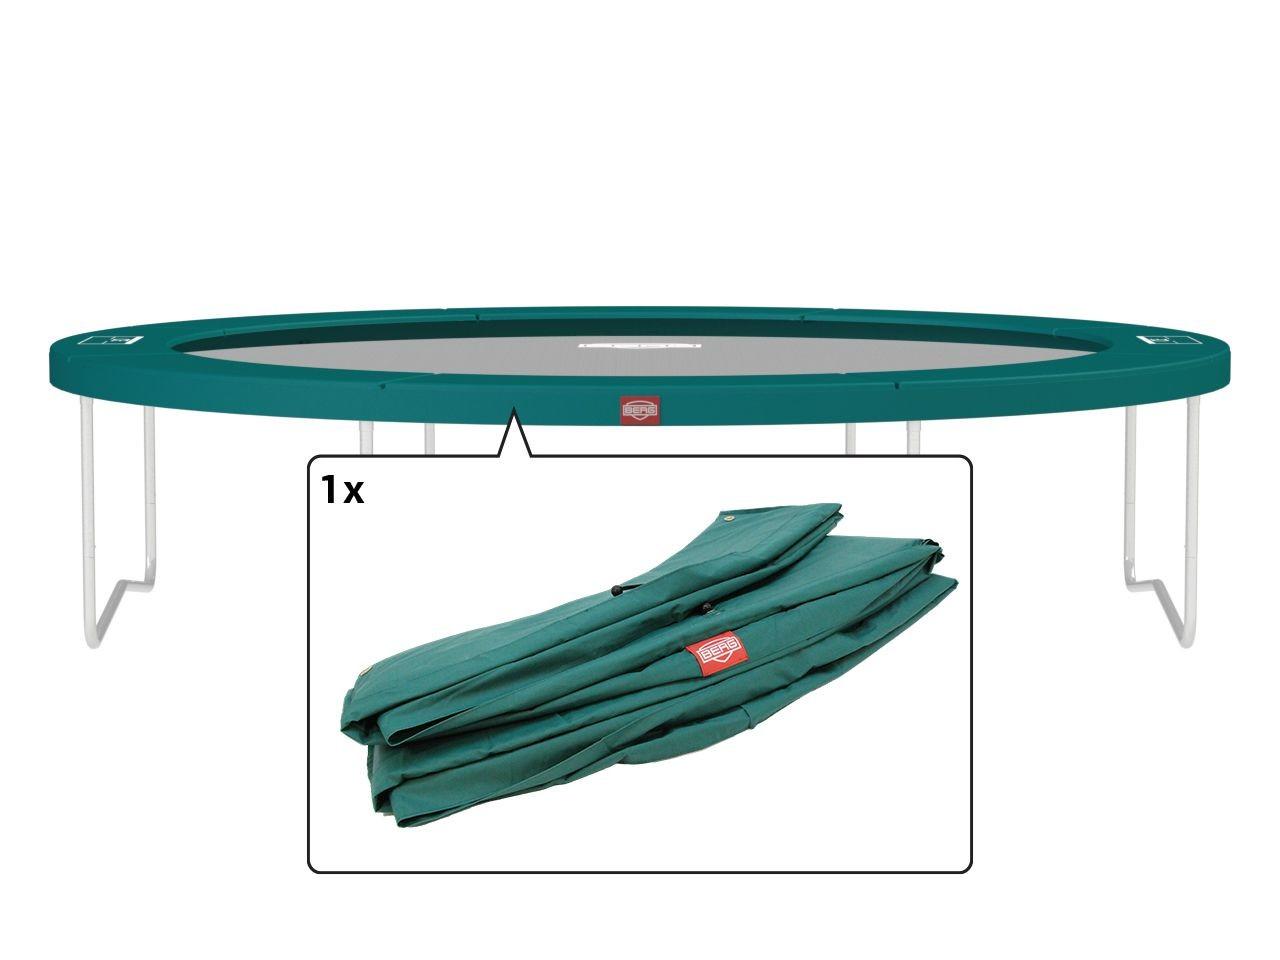 Favorit - Padding green 270 (9ft)